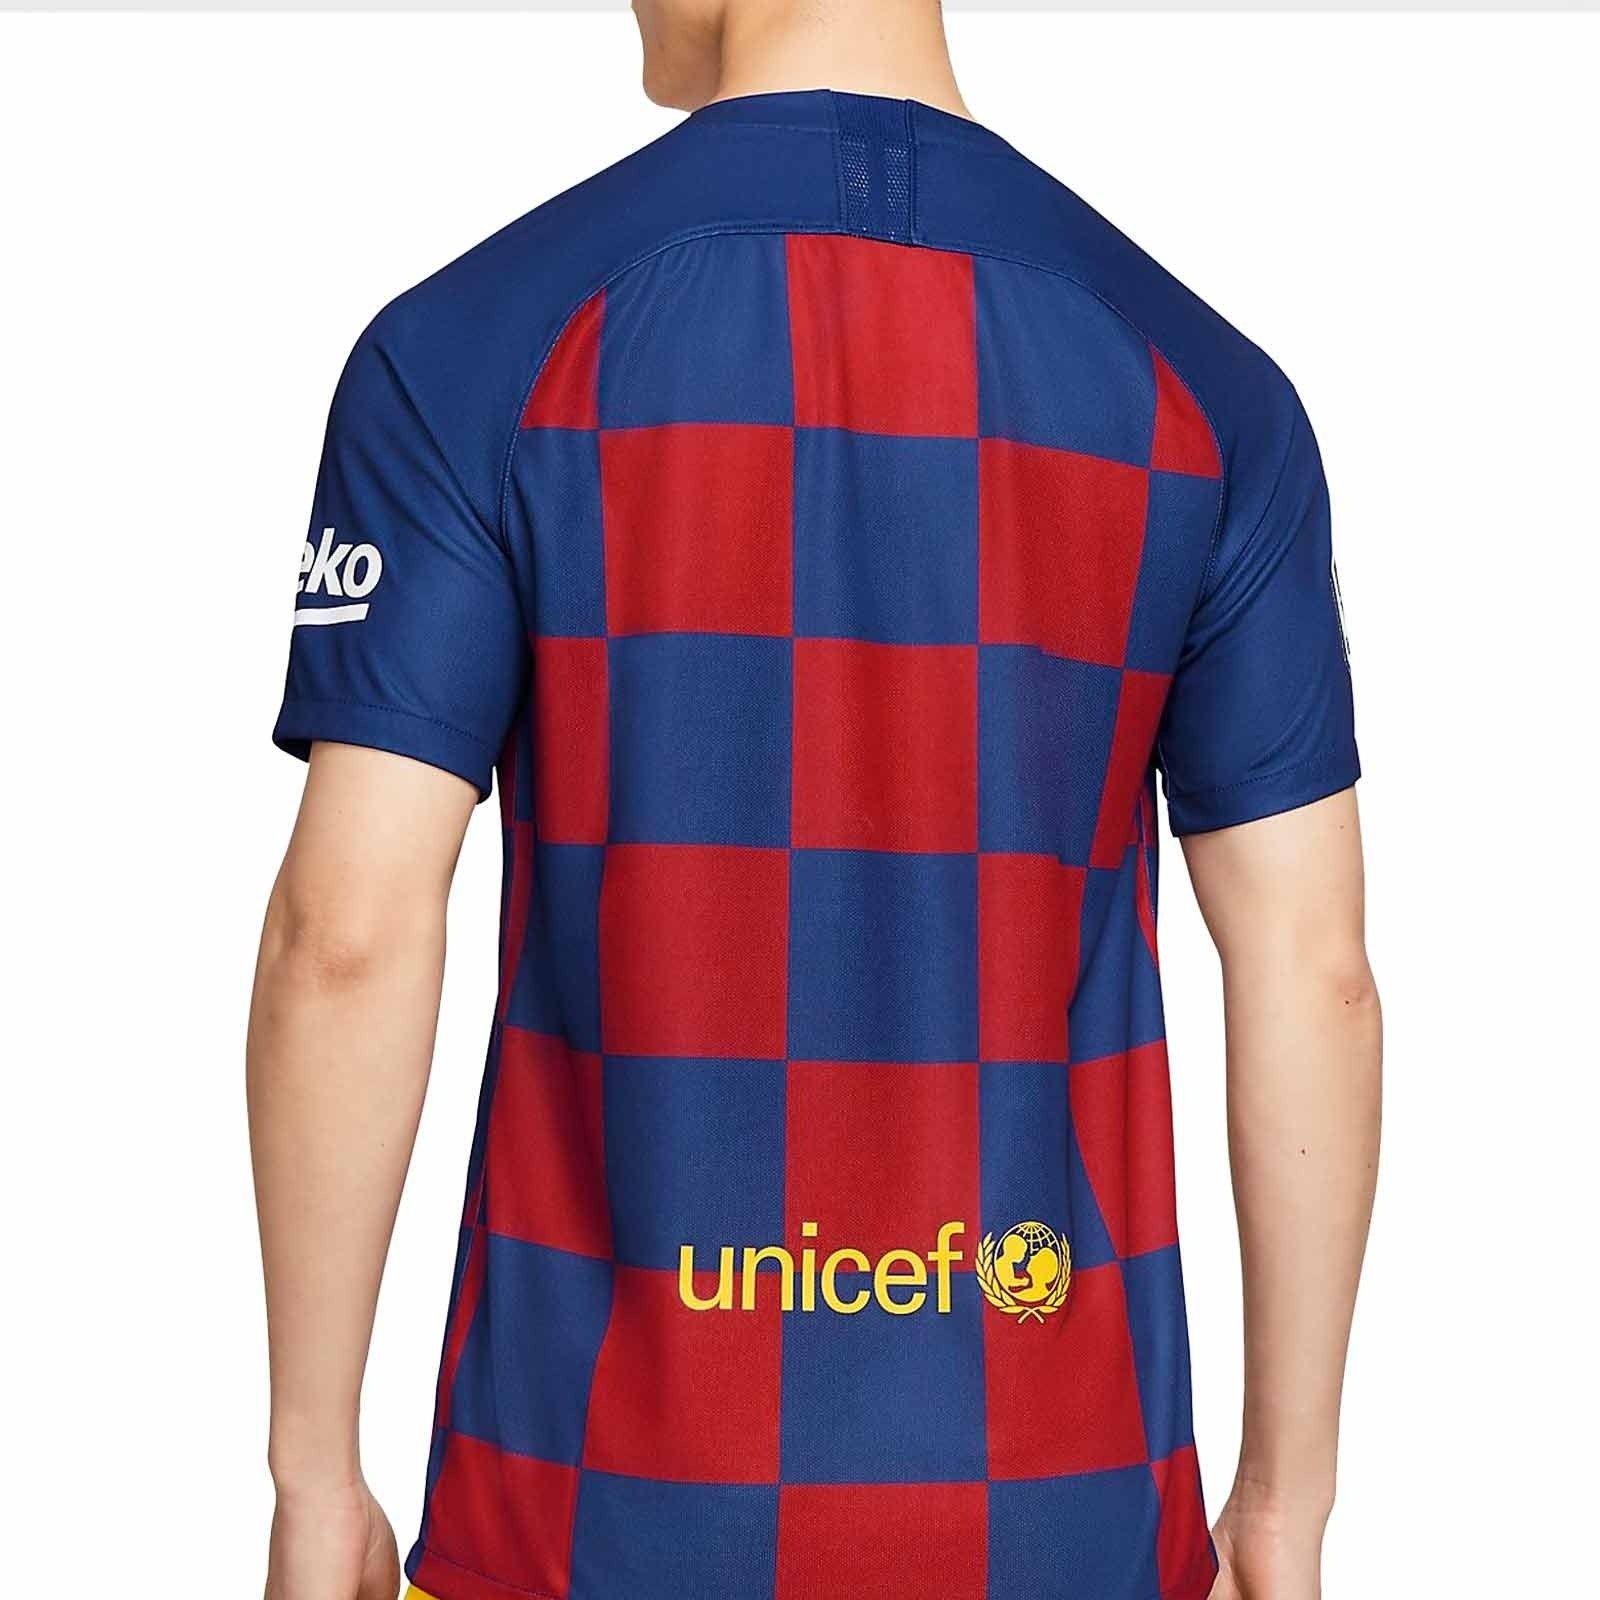 amargo Miseria Negligencia médica  Camiseta Nike Barcelona Stadium 2019 2020   Camisetas, Camisetas nike, Nike